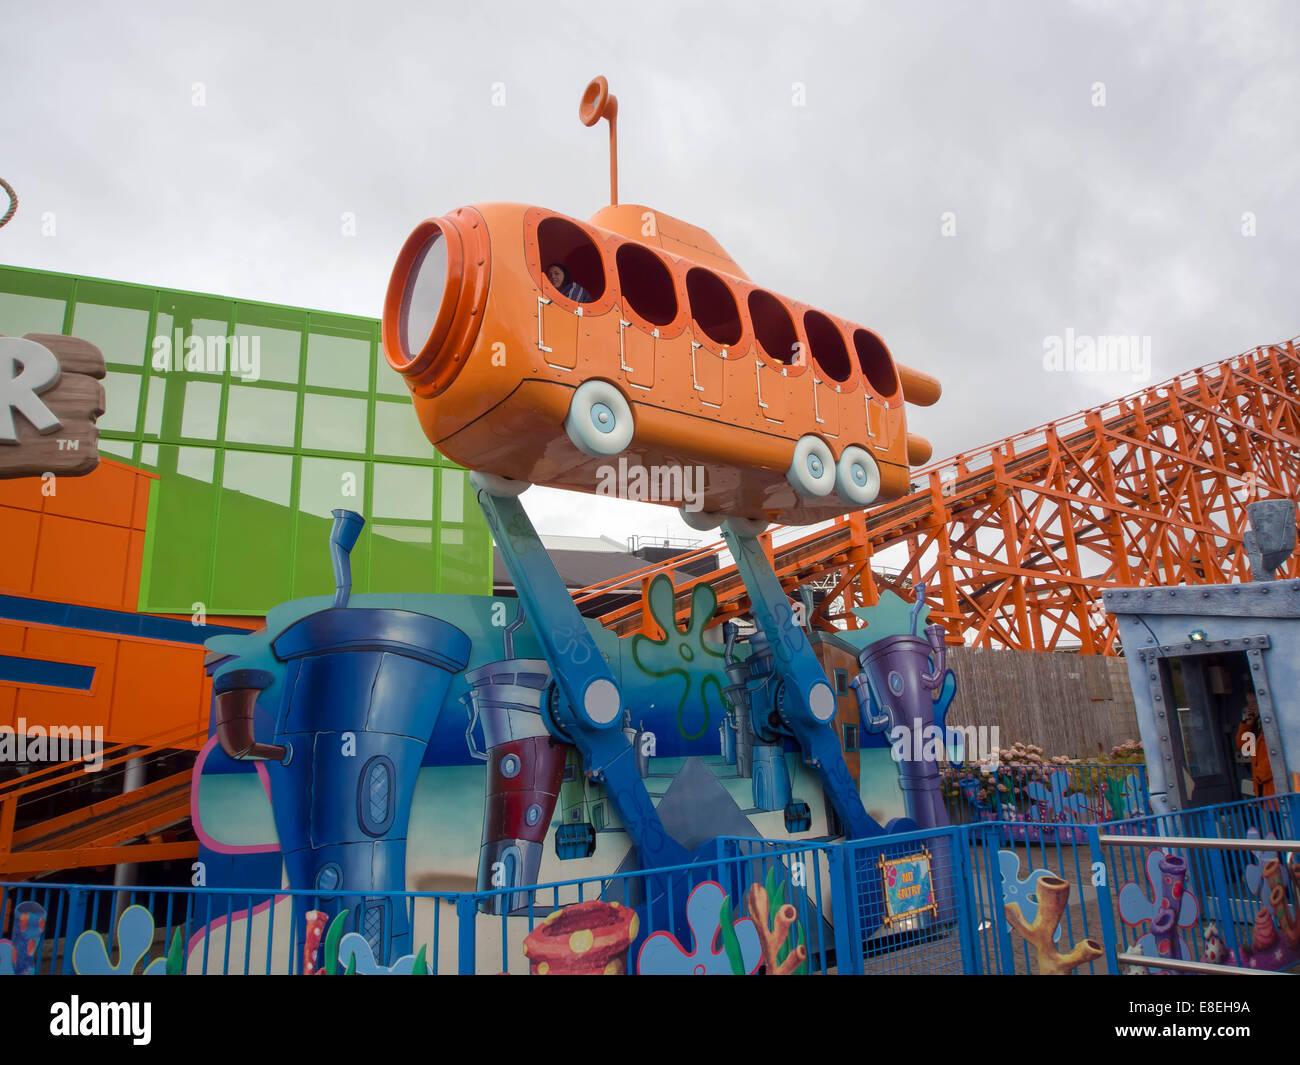 The Bikini Bottom Bus Tour ride at Blackpool Pleasure Beach, Lancashire, England - Stock Image